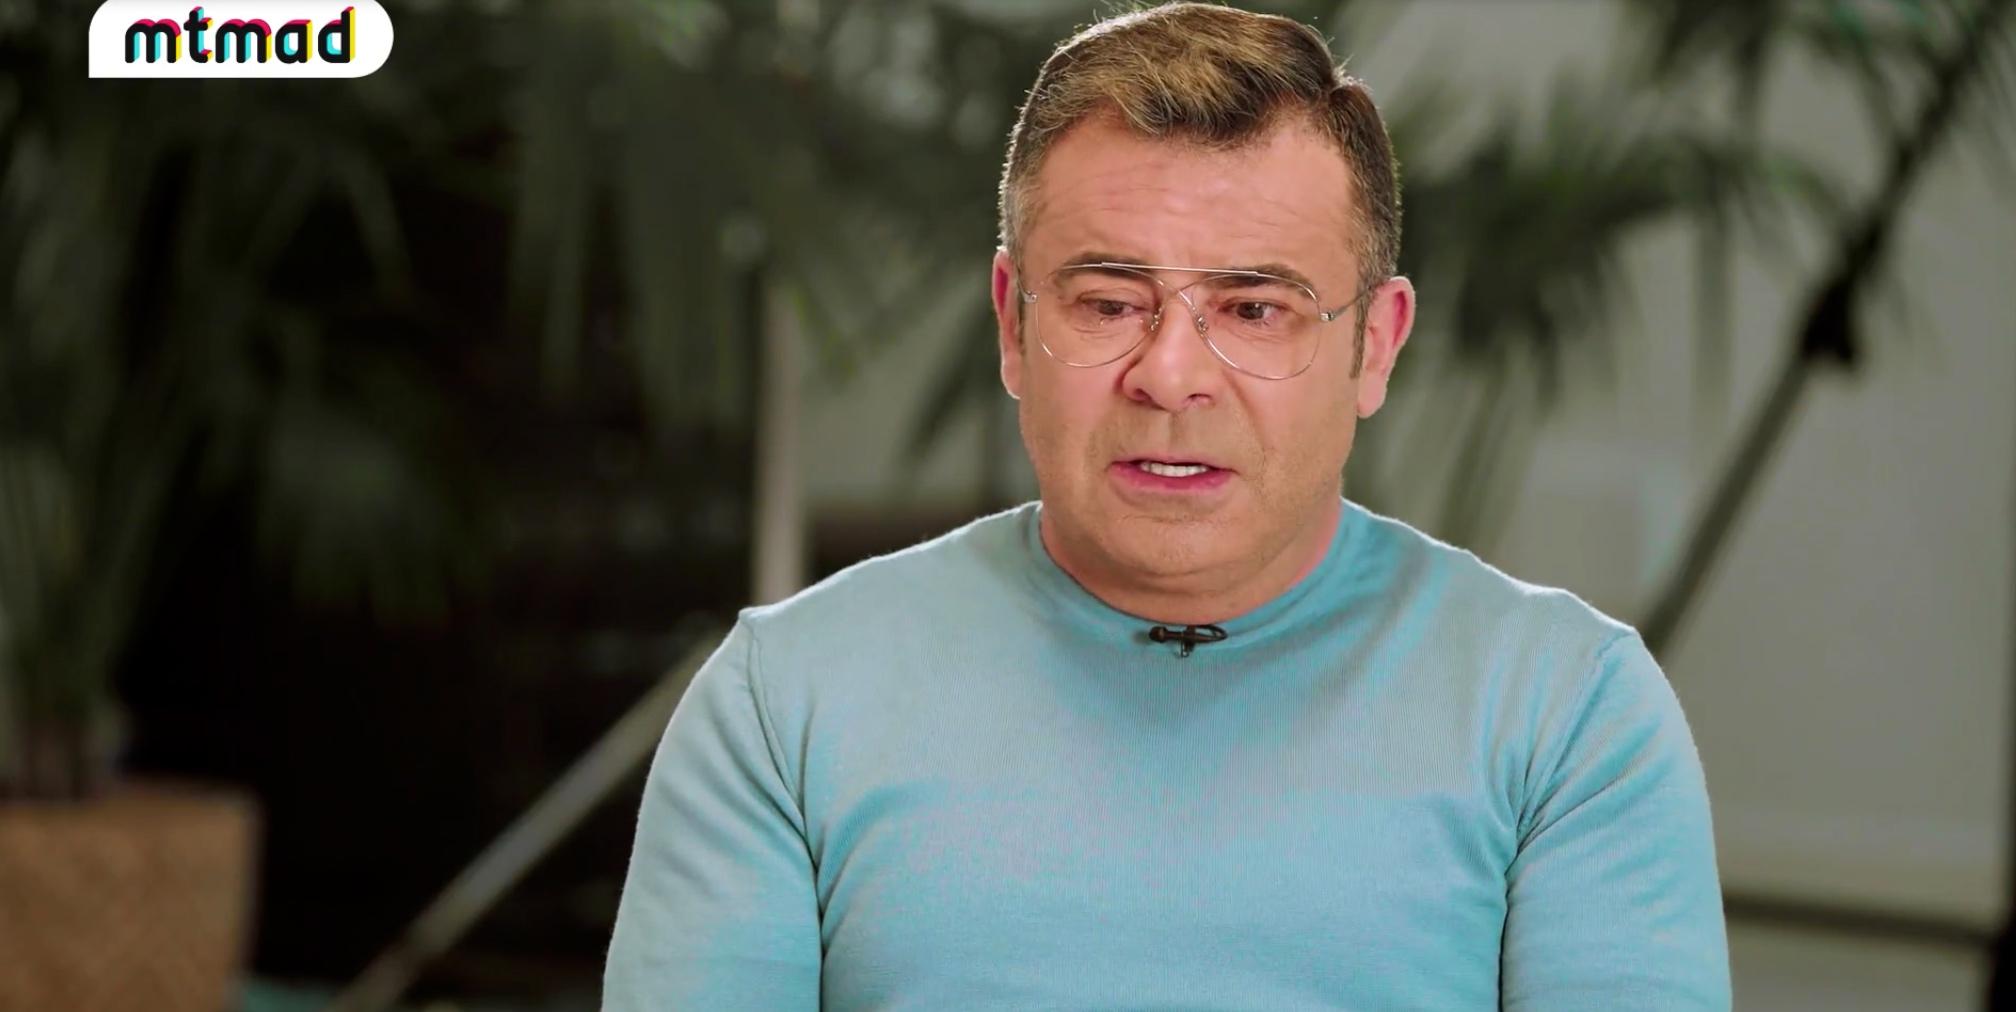 Jorge Javier se sincera en una entrevista amb Jesús Vázquez - Mtmad